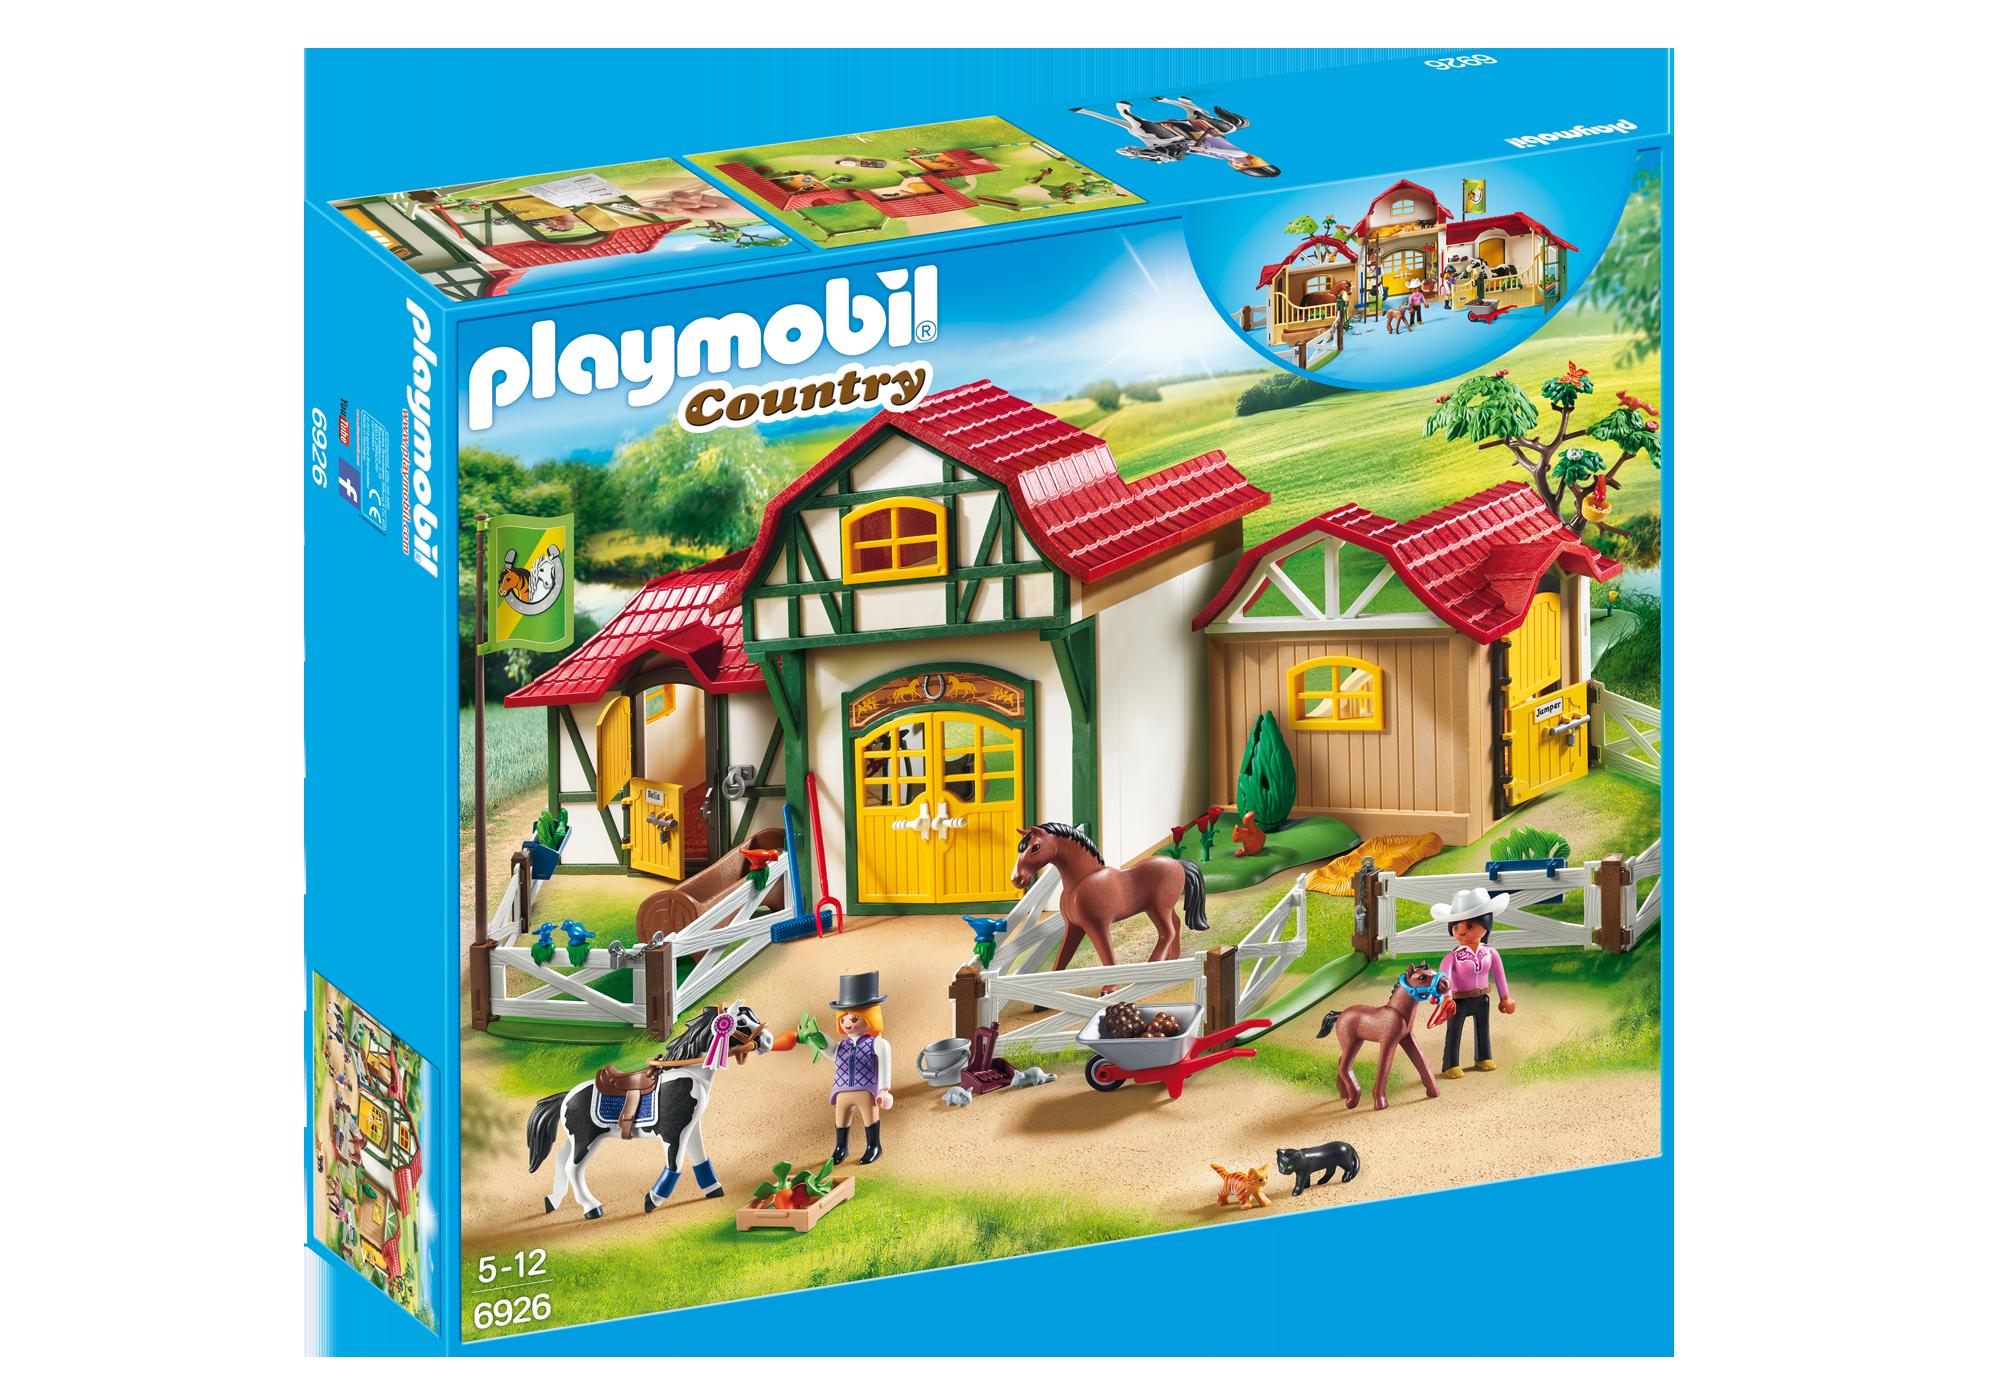 http://media.playmobil.com/i/playmobil/6926_product_box_front/Paardrijclub